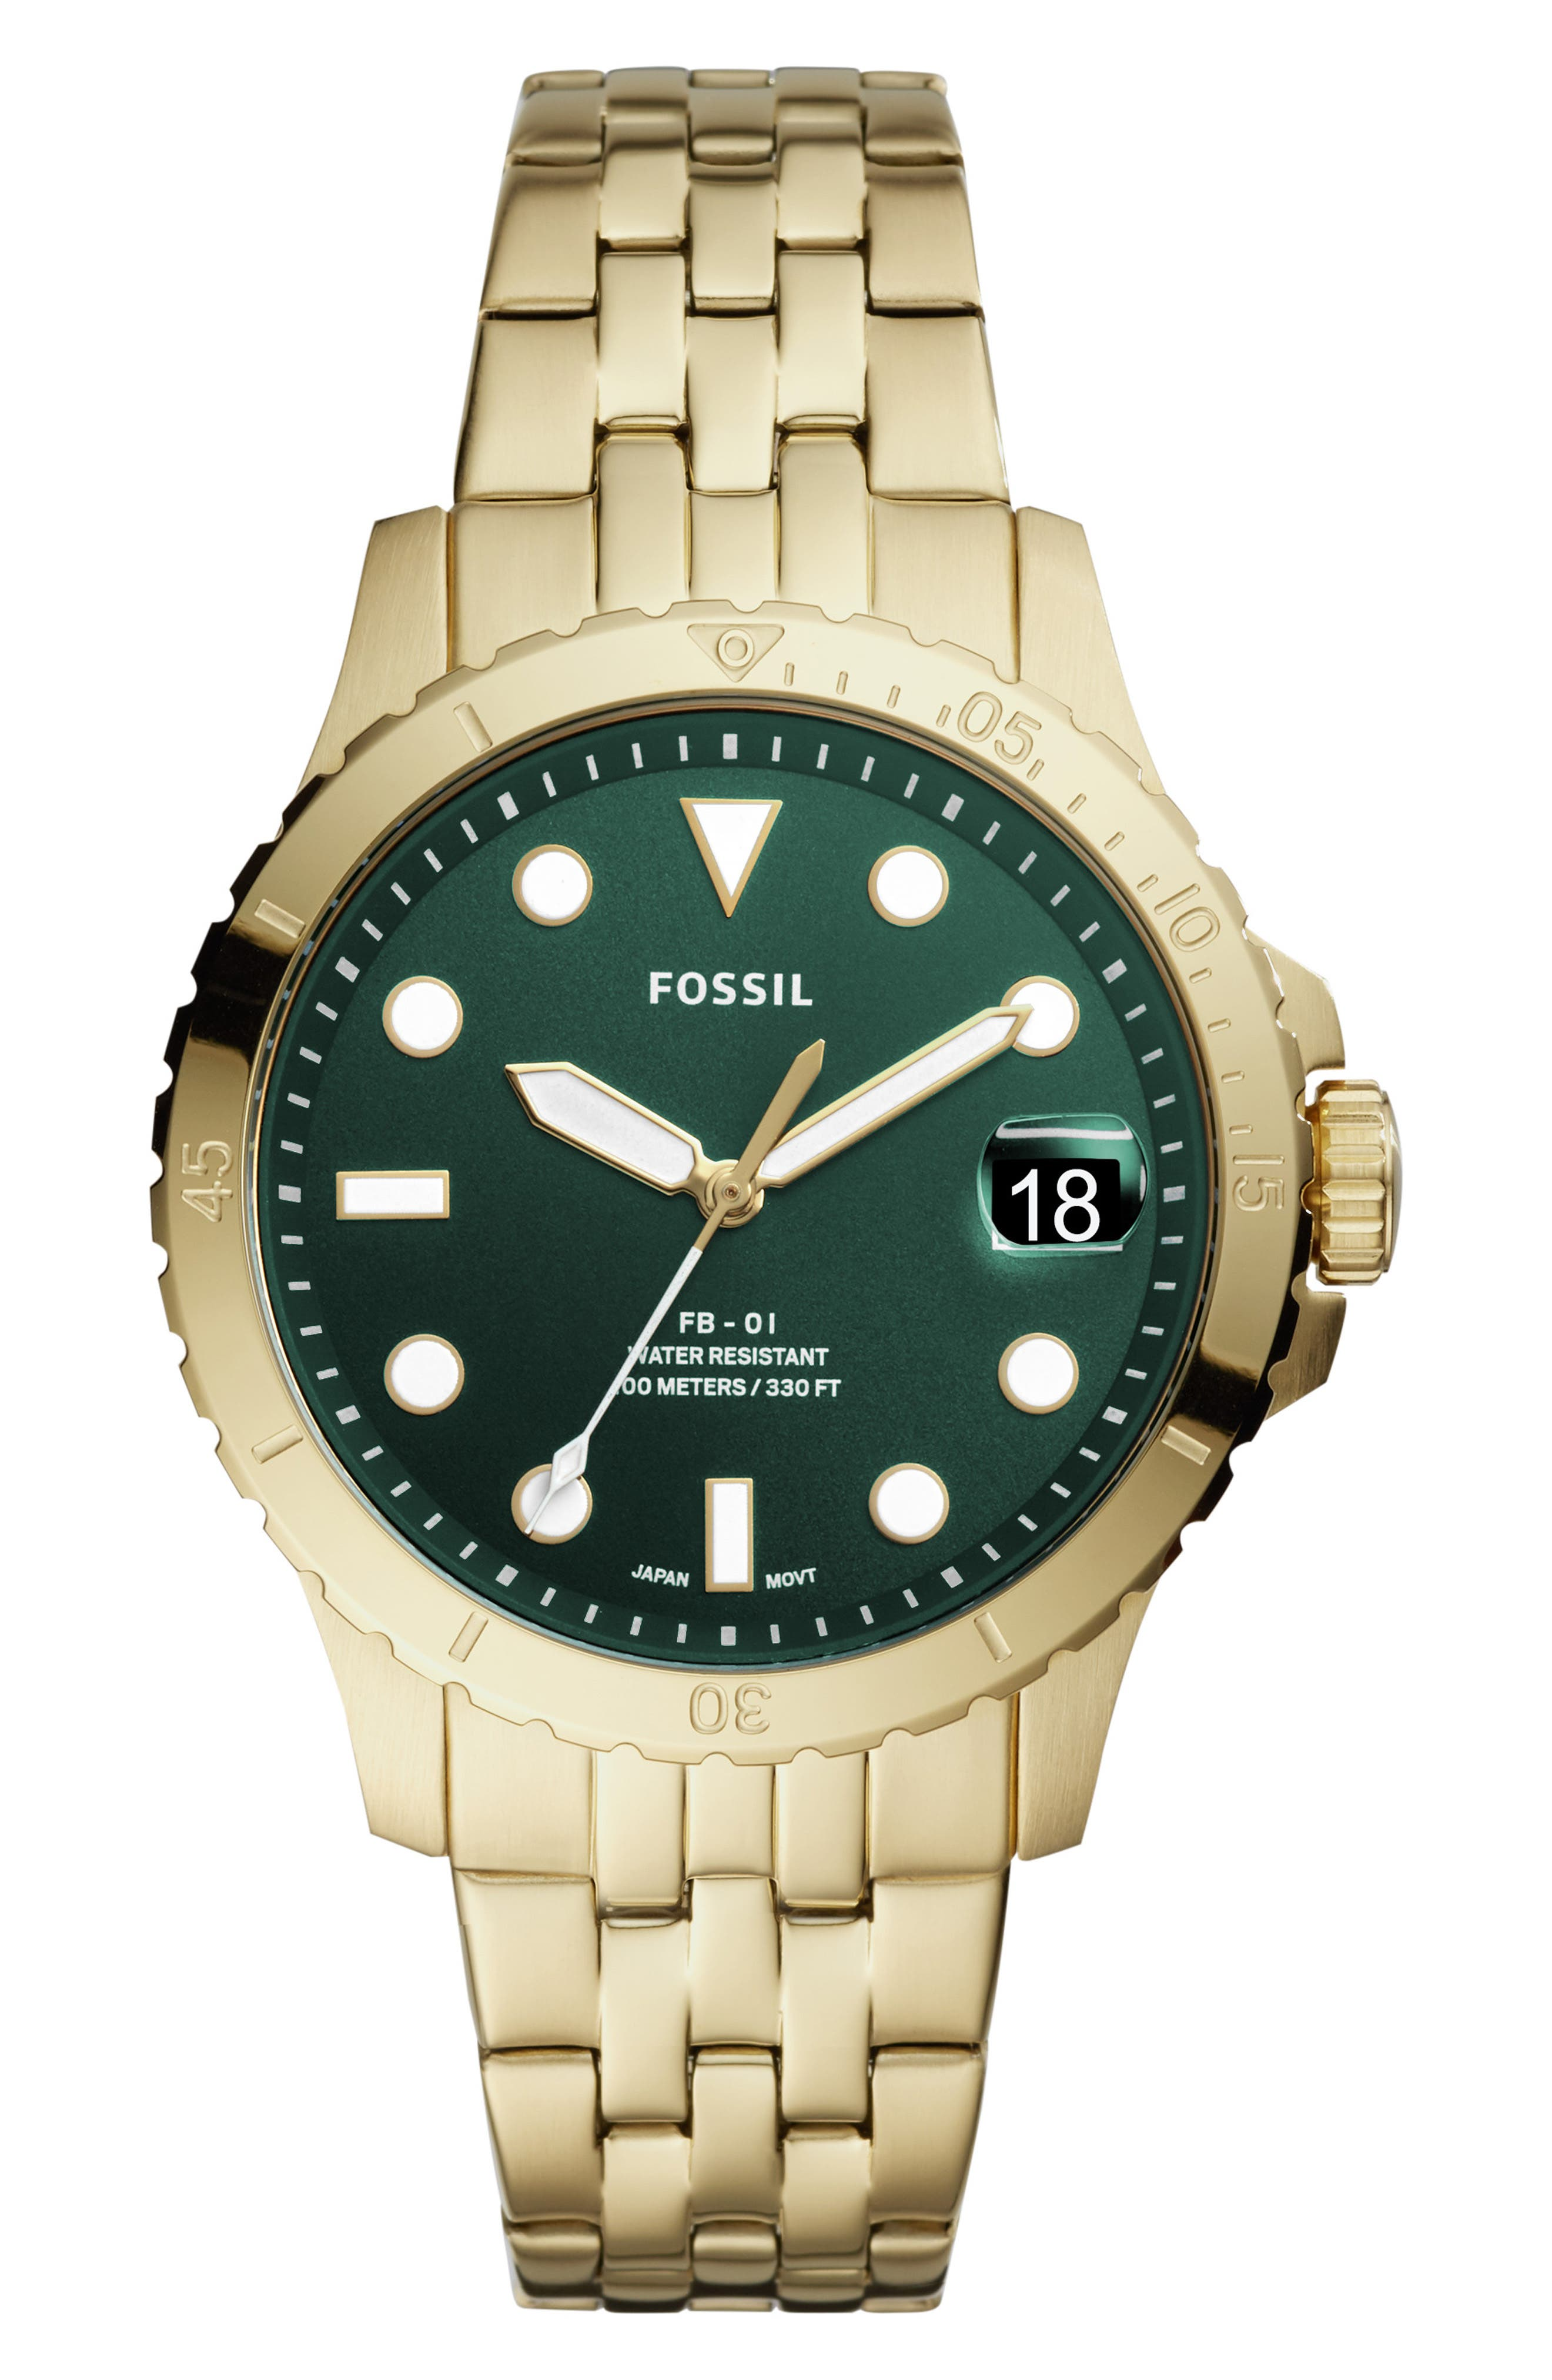 Fb-01 Bracelet Watch